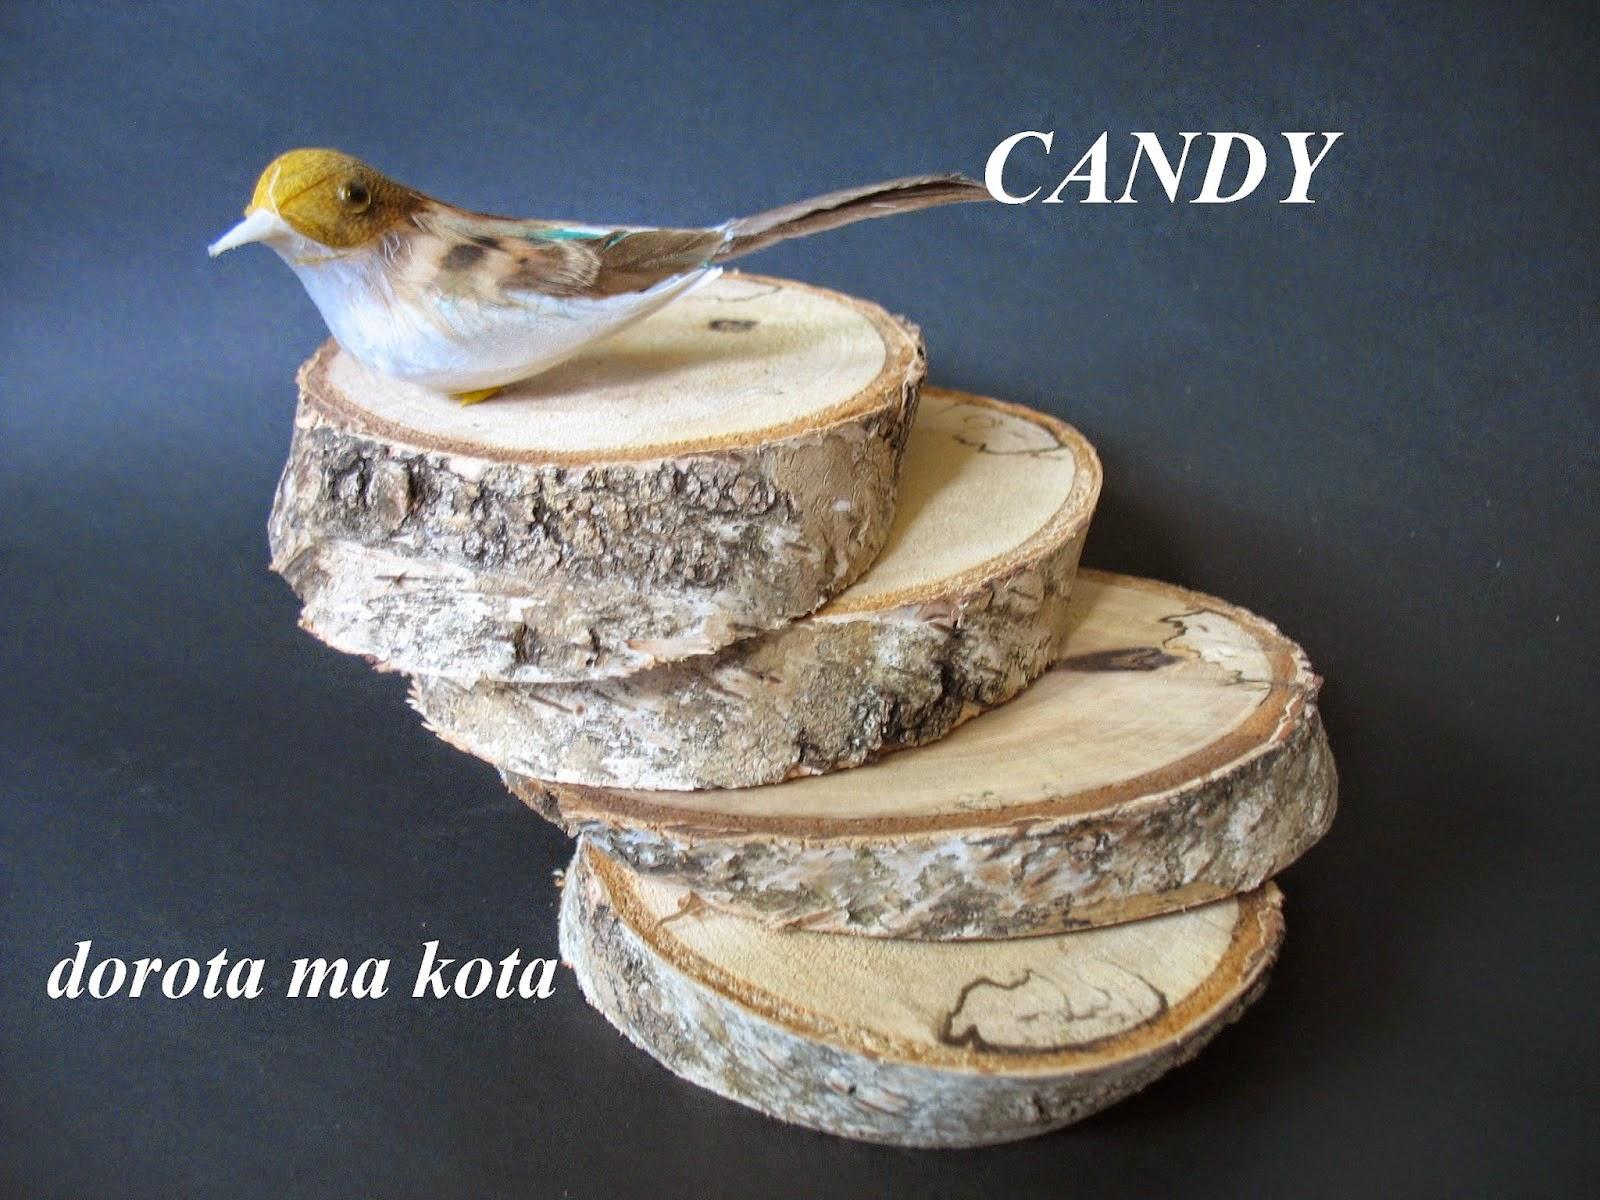 Brzozowe candy u Doroty